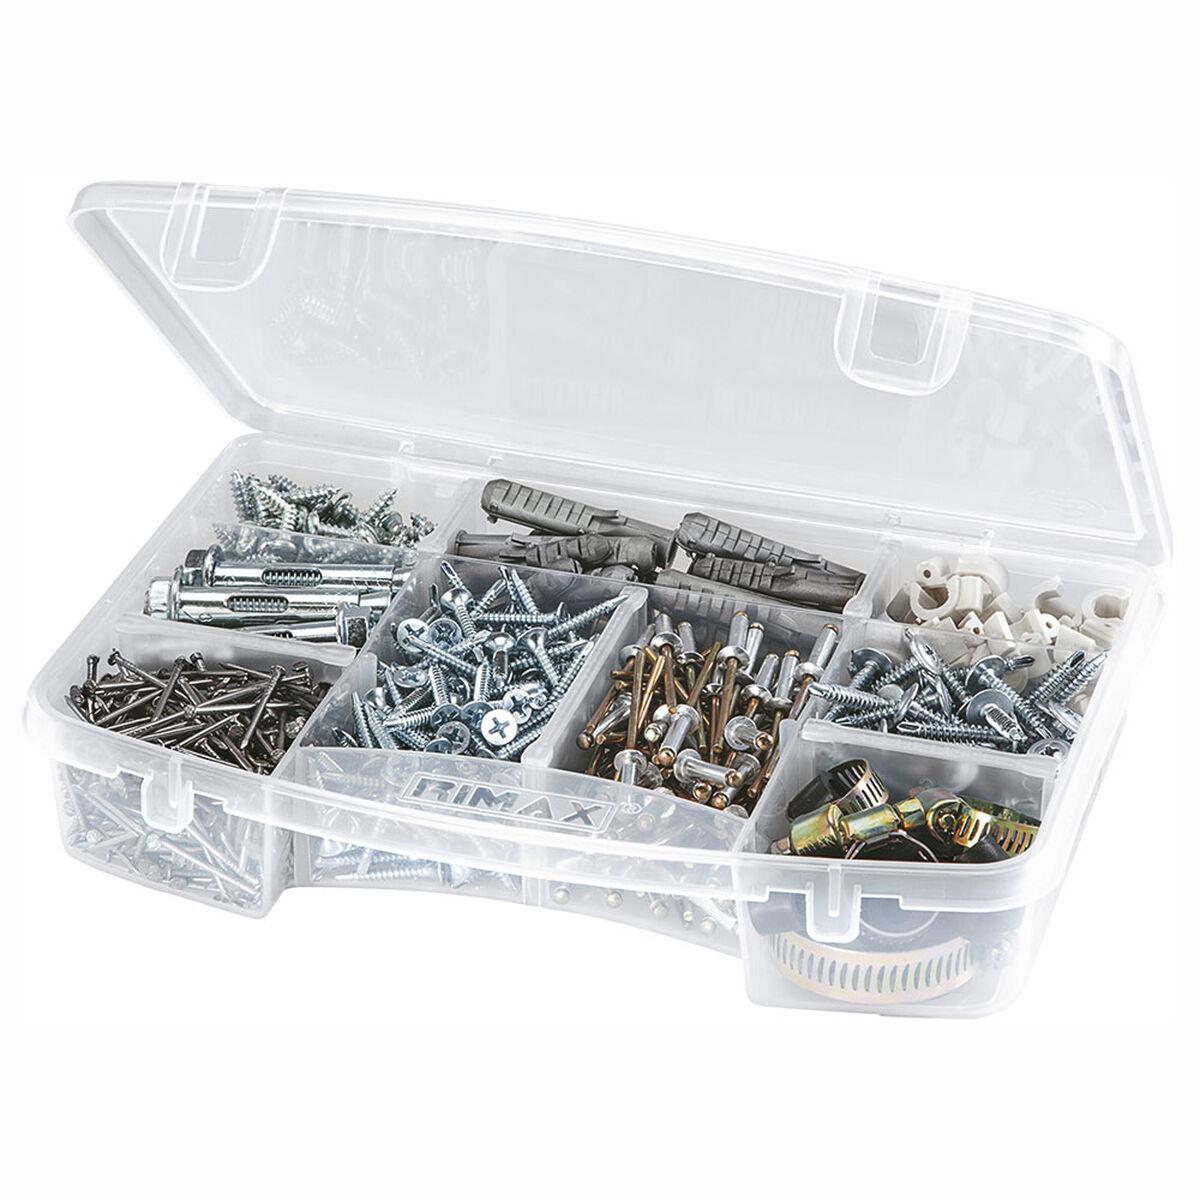 Caja Organizadora  Rimax Transparente De 5 Divisiones